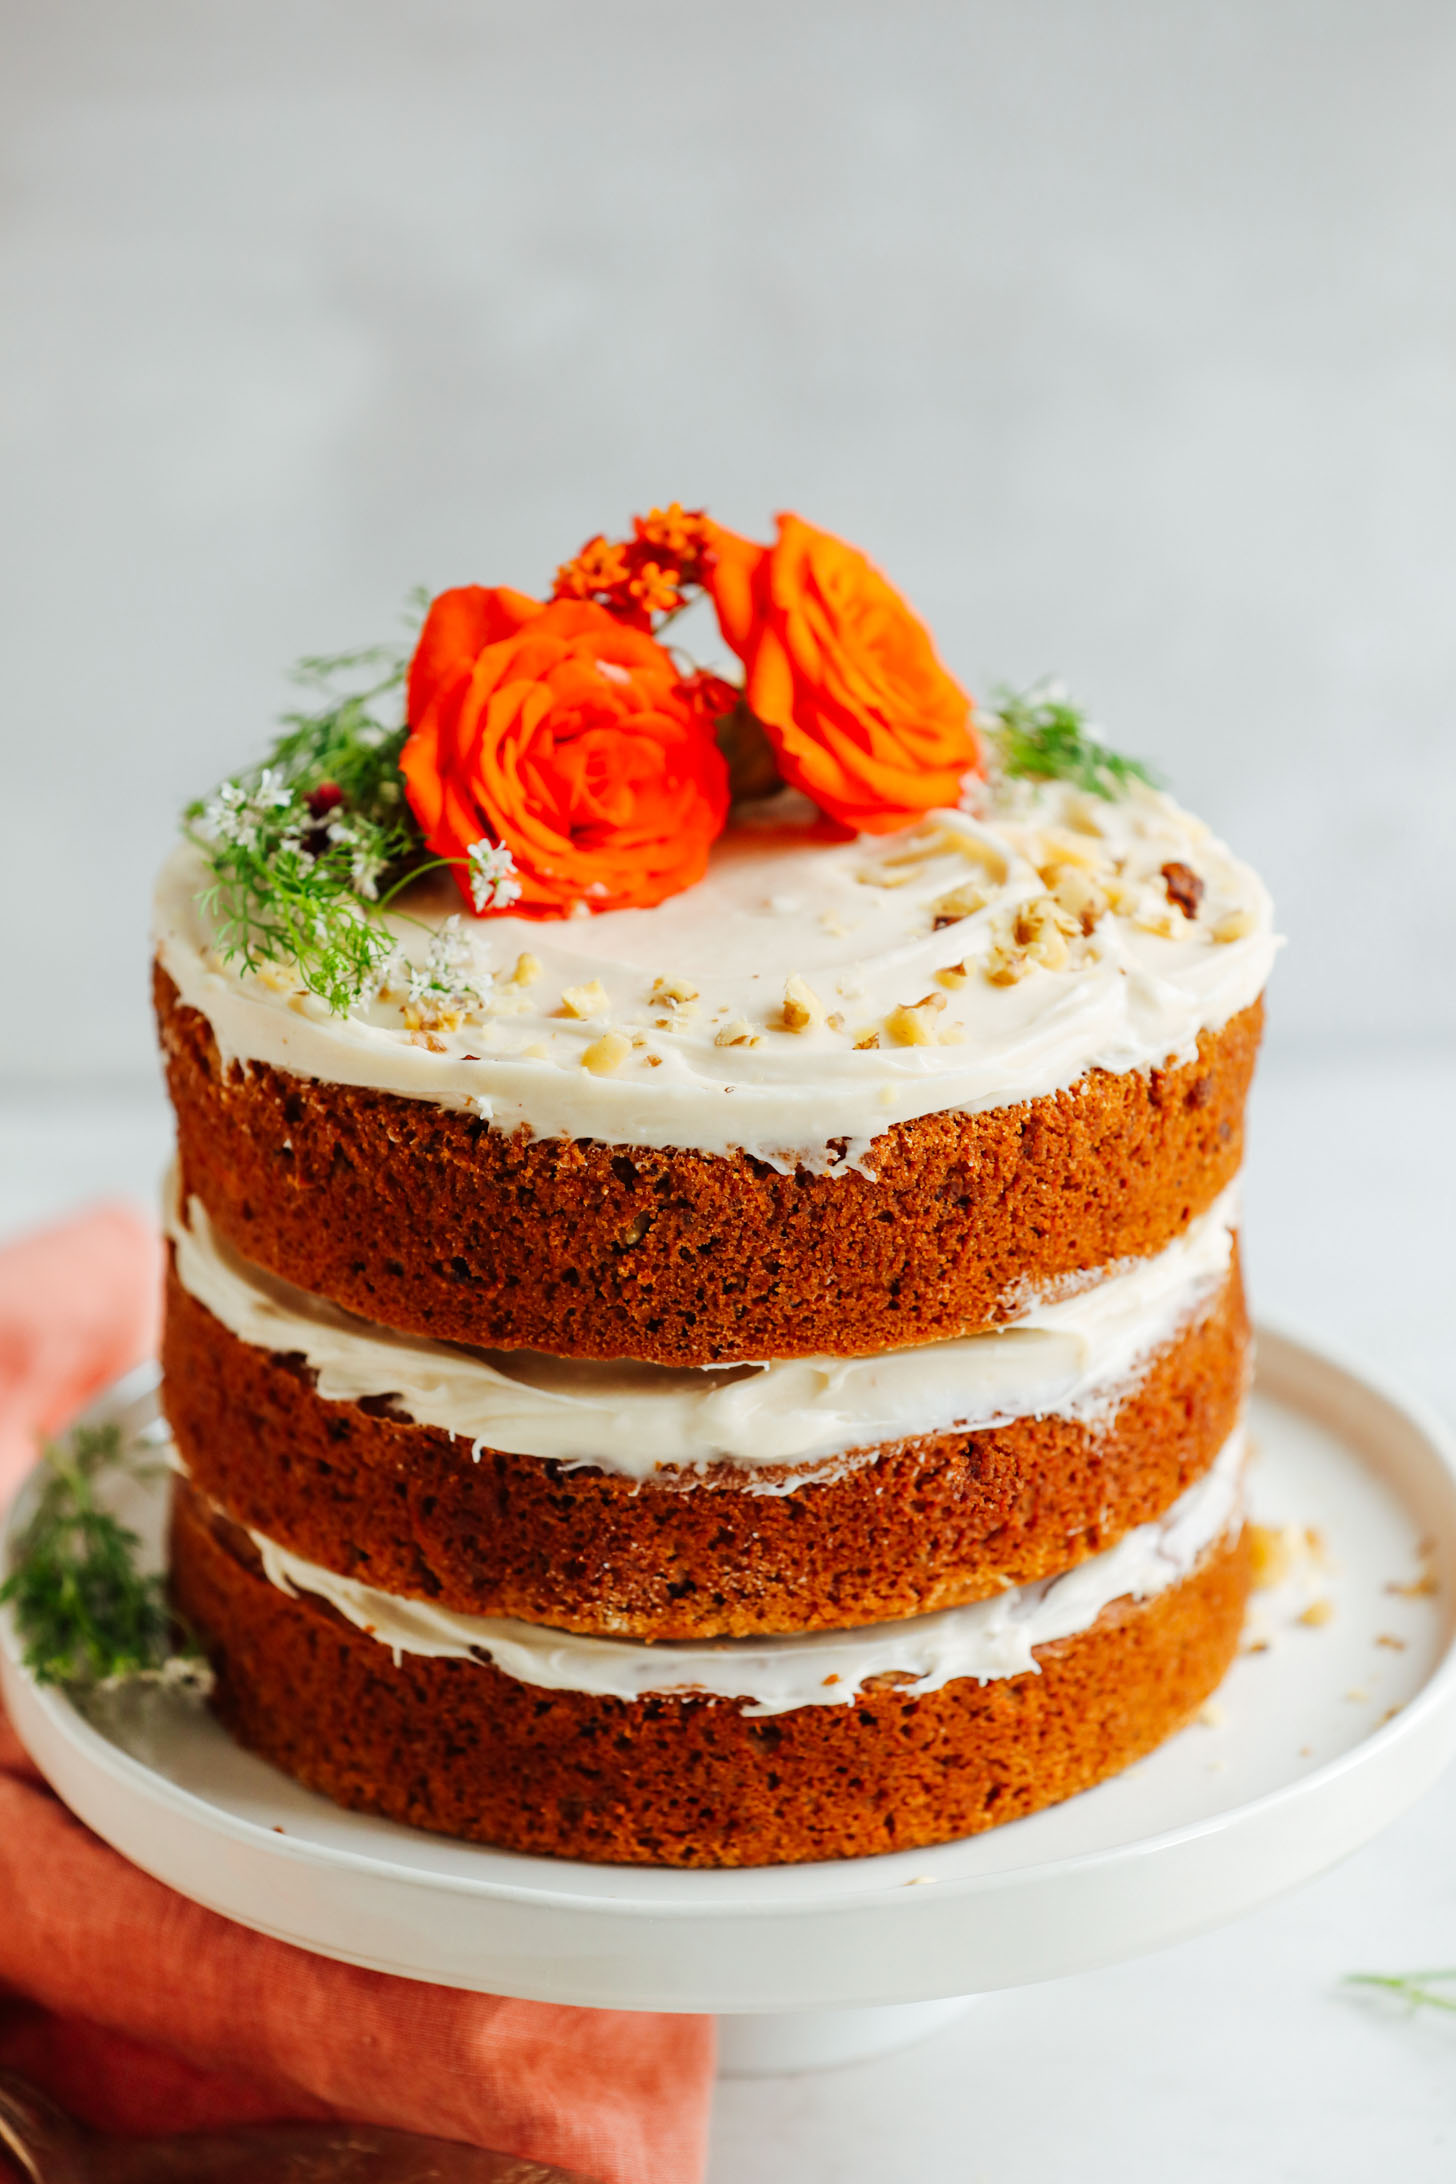 Vegan Gluten-Free Carrot Cake | Minimalist Baker Recipes